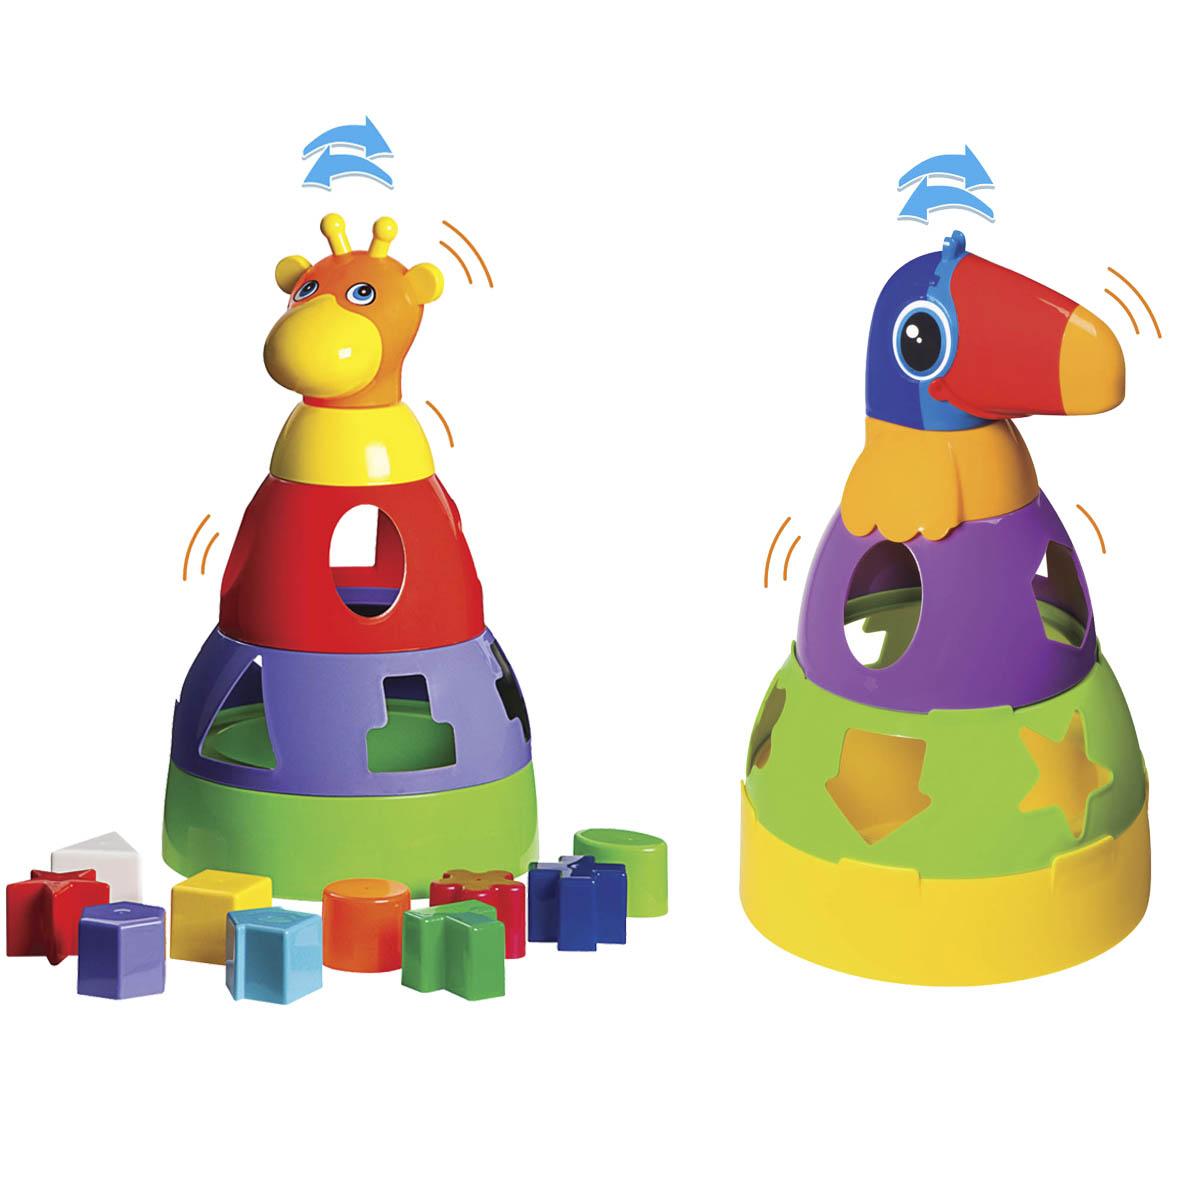 Brinquedos Educativo para Bebês